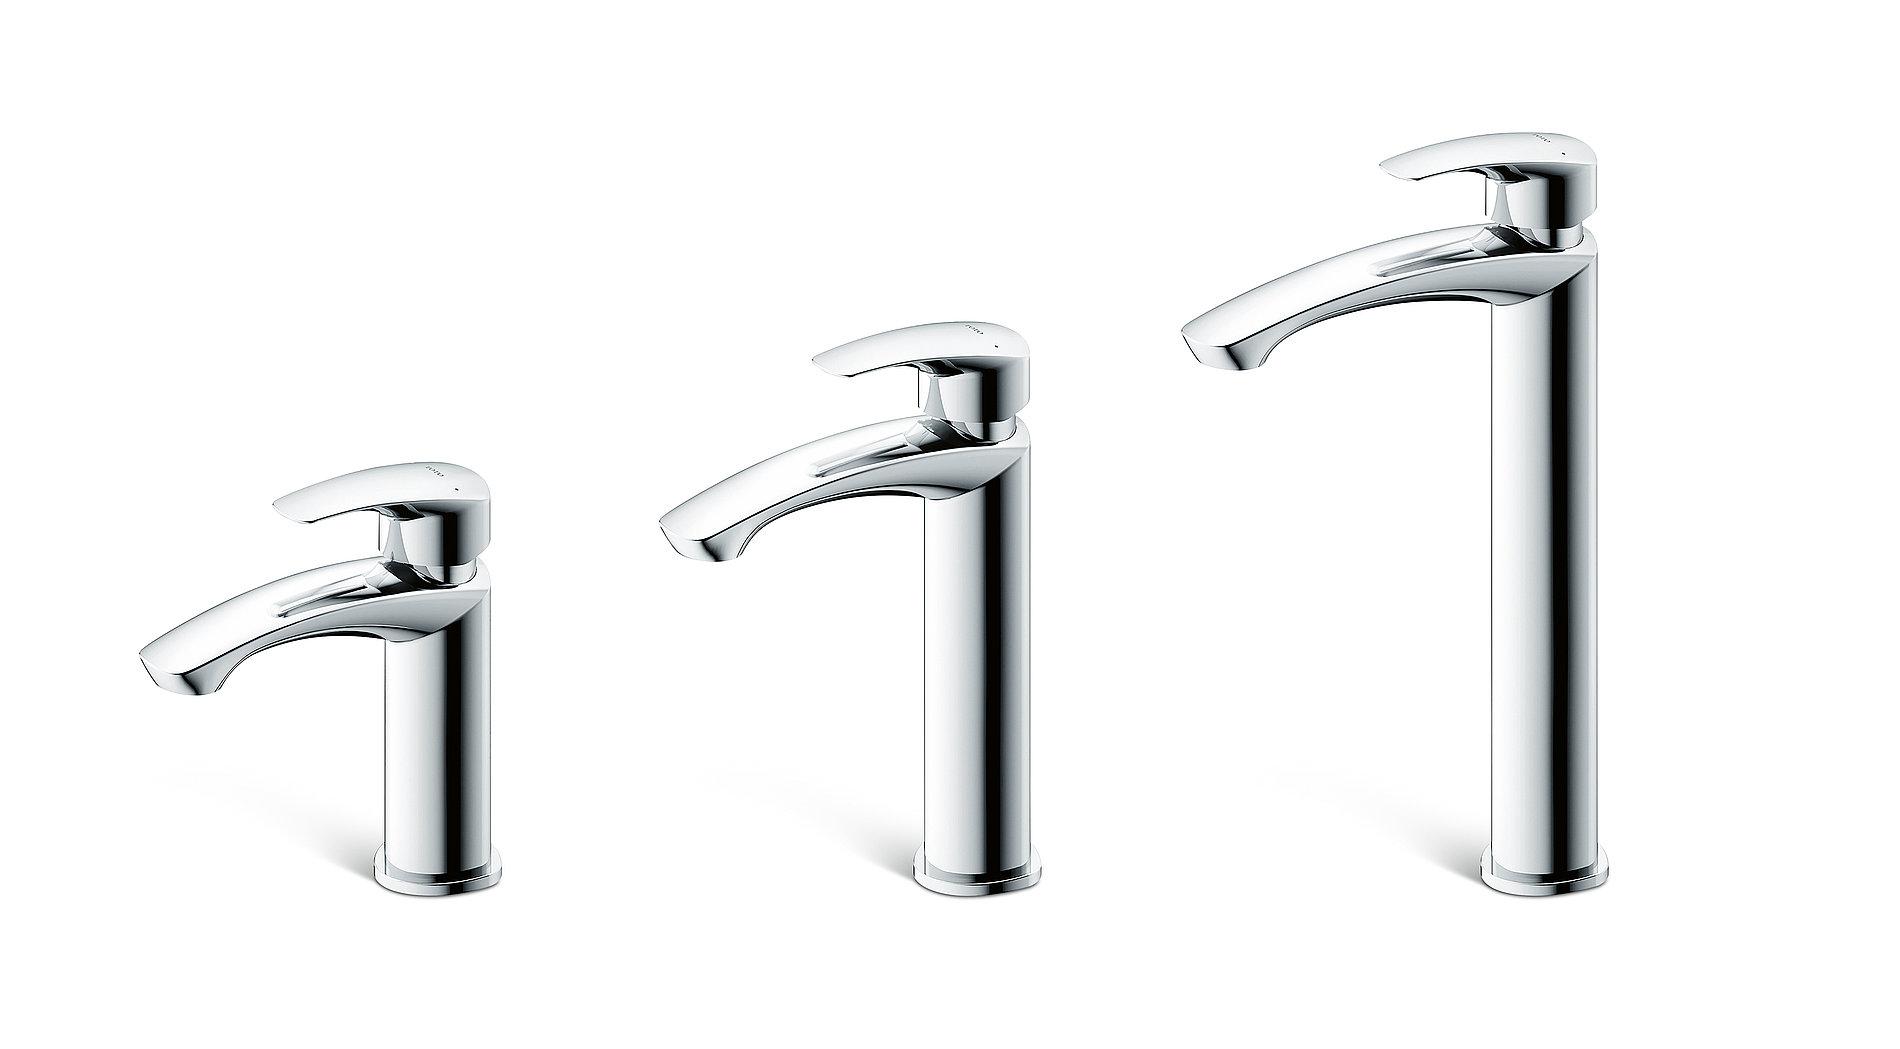 GM series lavatory faucet | Red Dot Design Award